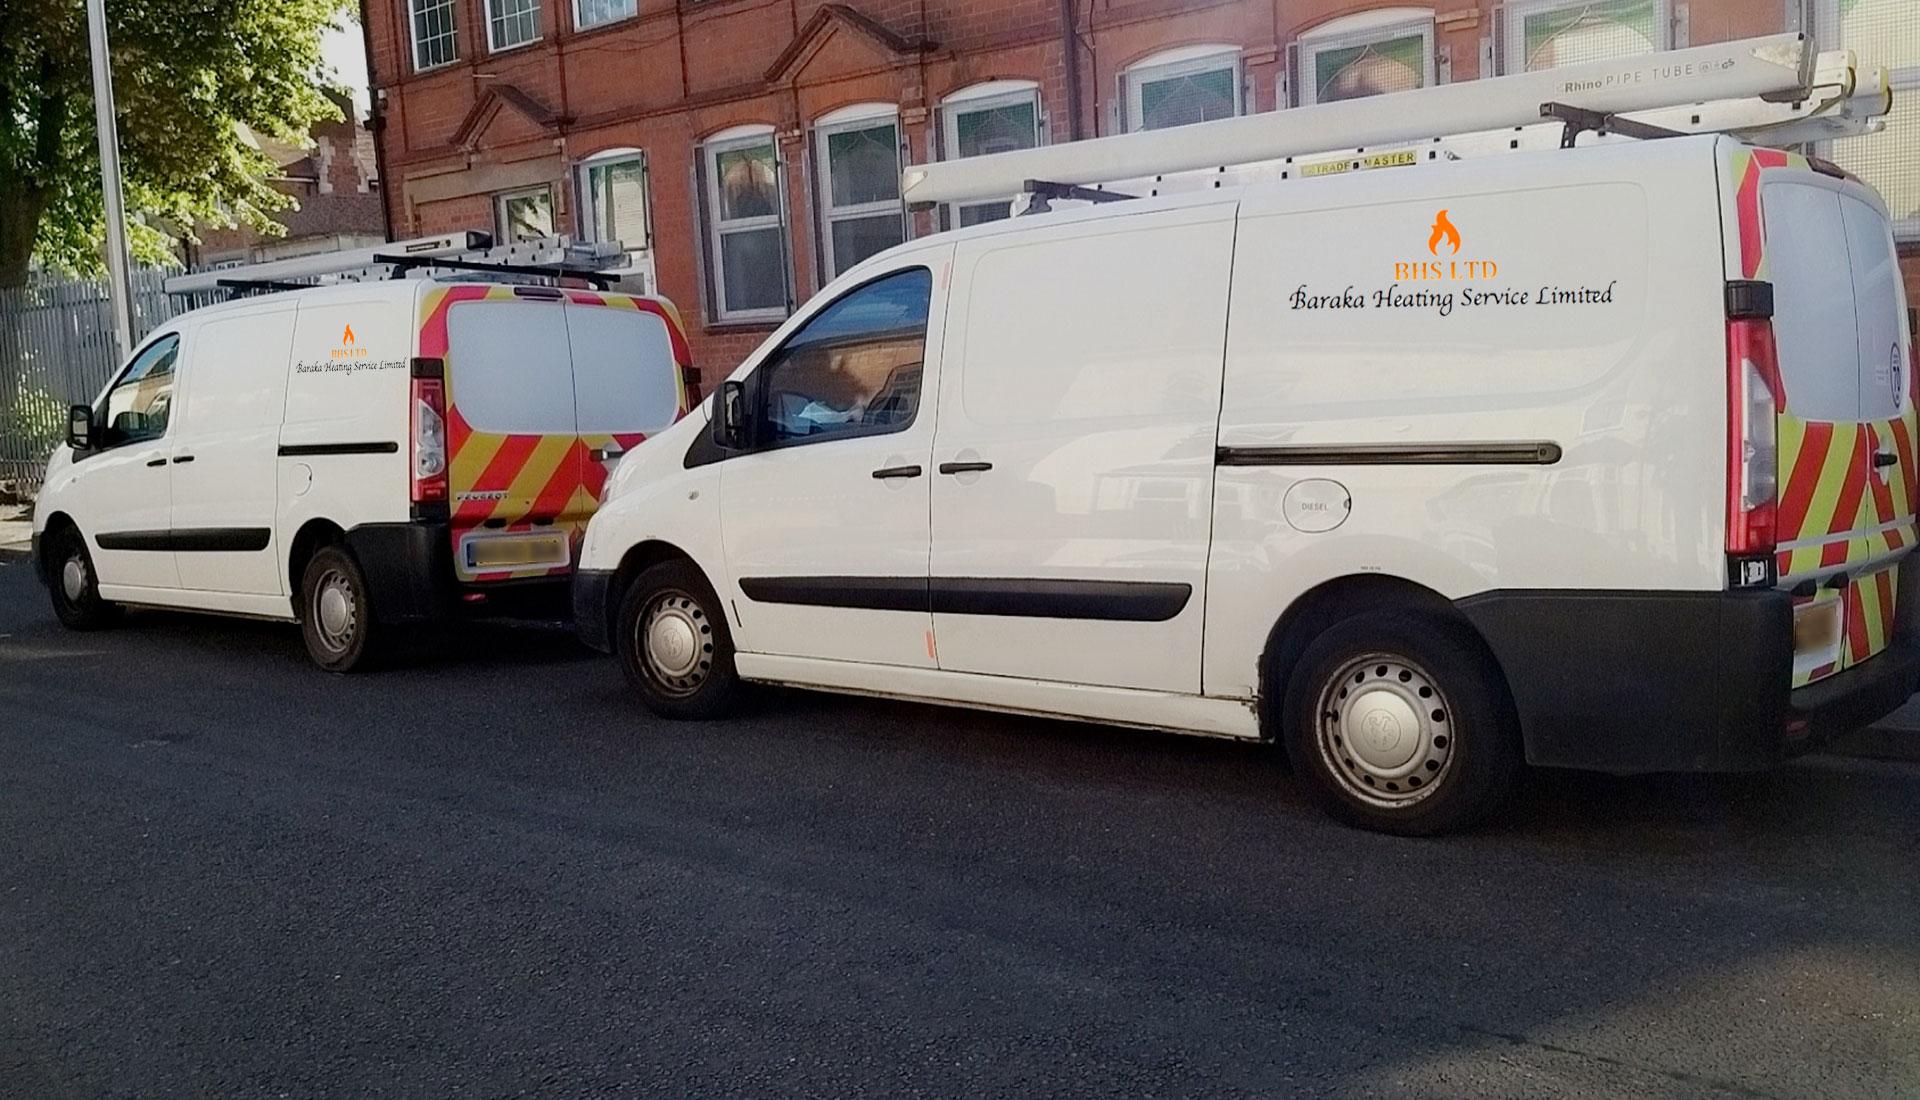 Baraka Heating Services Ltd